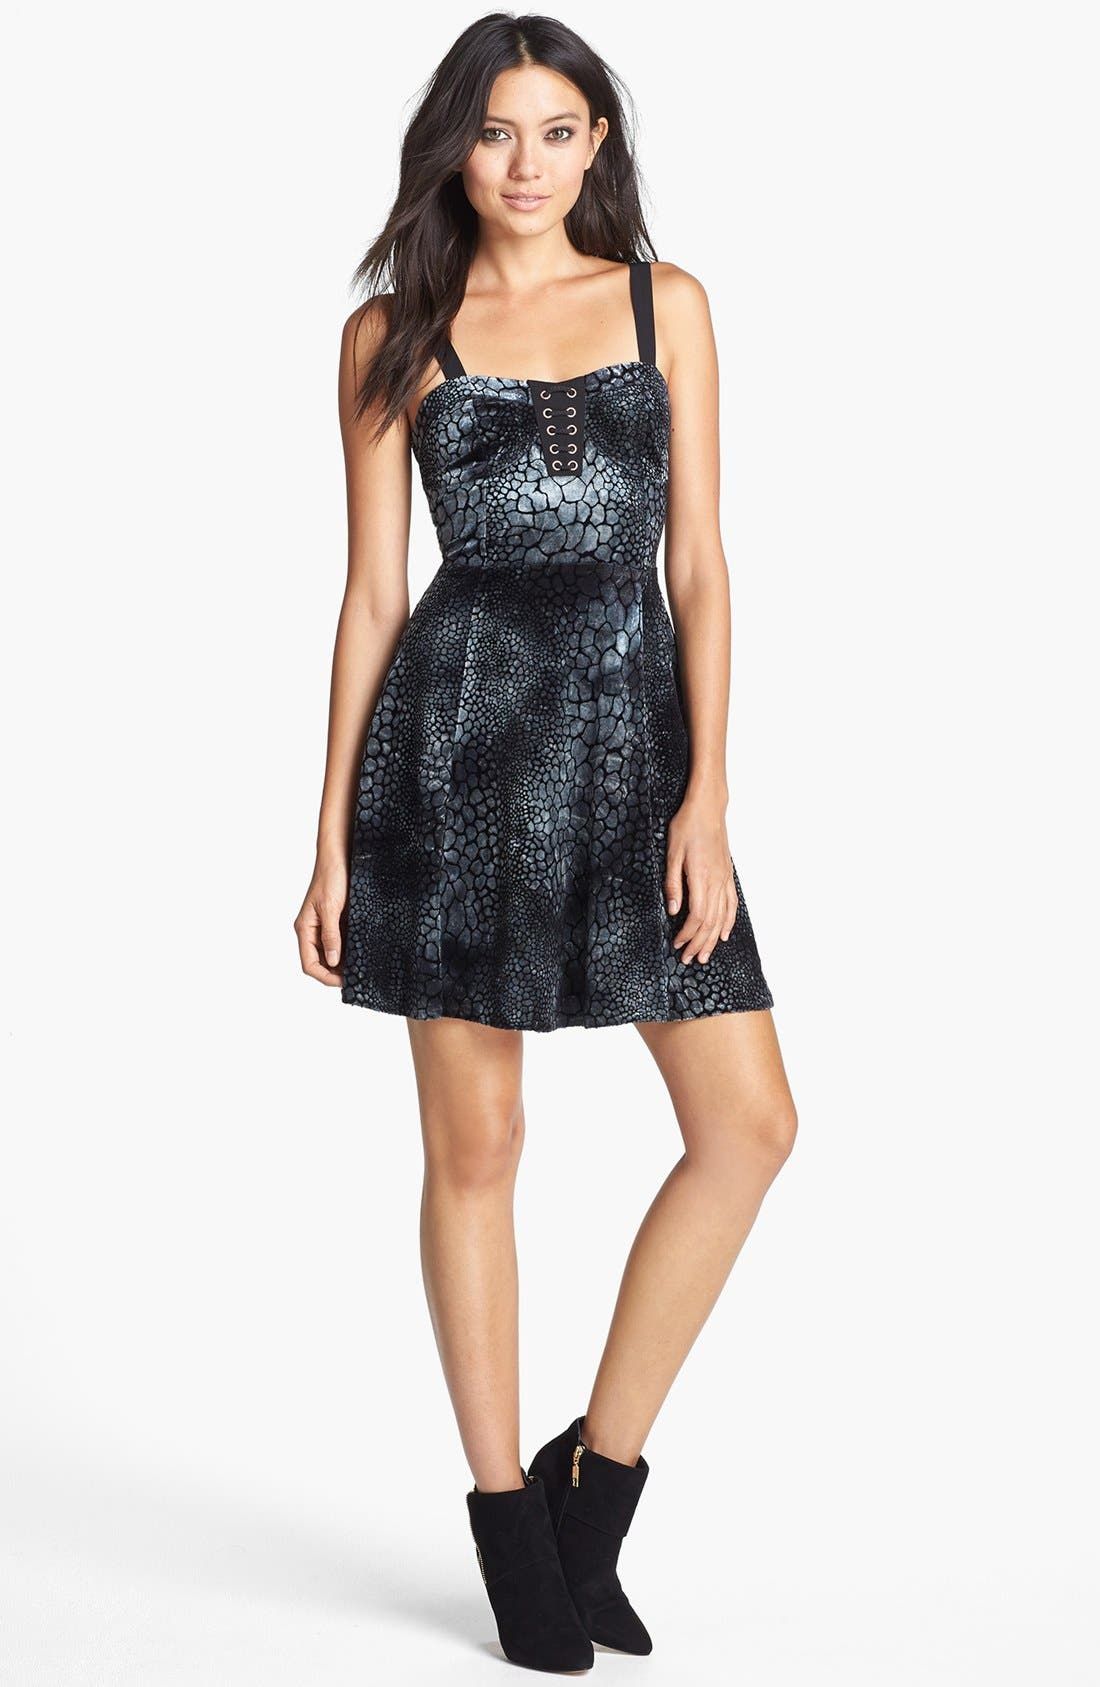 Alternate Image 1 Selected - MINKPINK 'Croc Dead Gorgeous' Cutout Dress